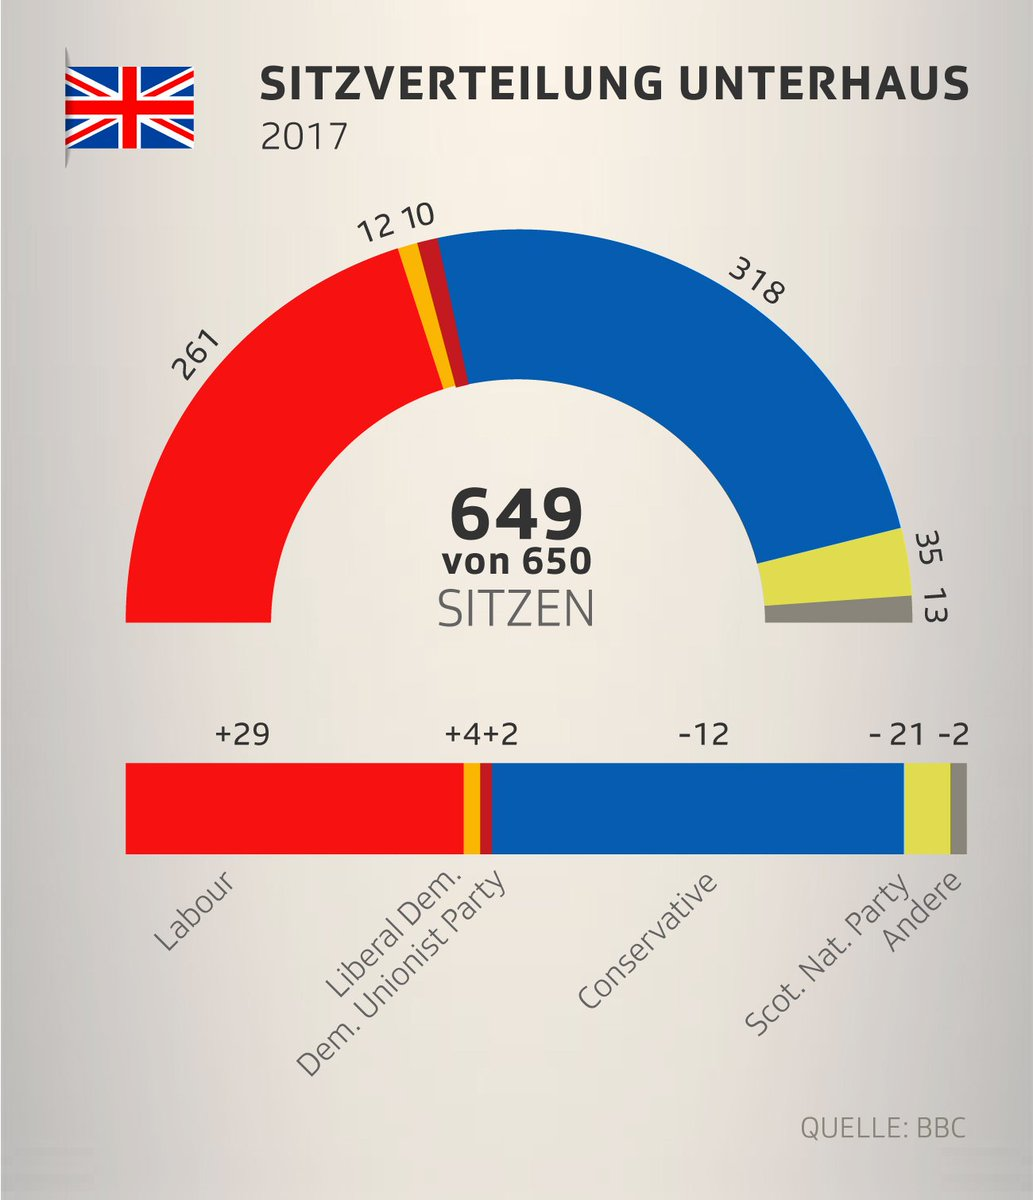 #Tories